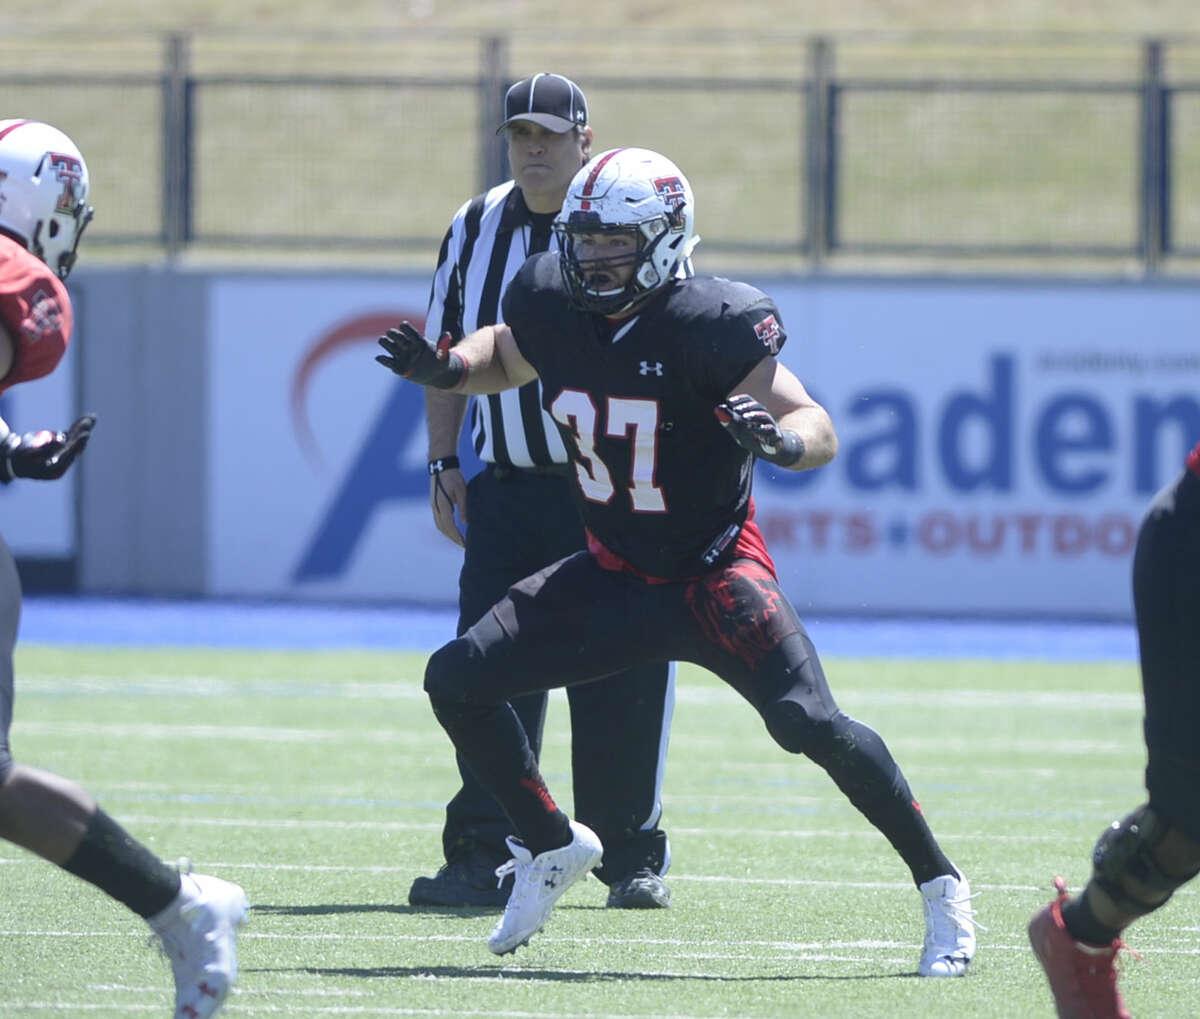 Texas Tech linebacker Luke Stice, a Lee High graduate, runs plays during the spring scrimmage Saturday, April 2, 2016, at Grande Communications Stadium. James Durbin/Reporter-Telegram